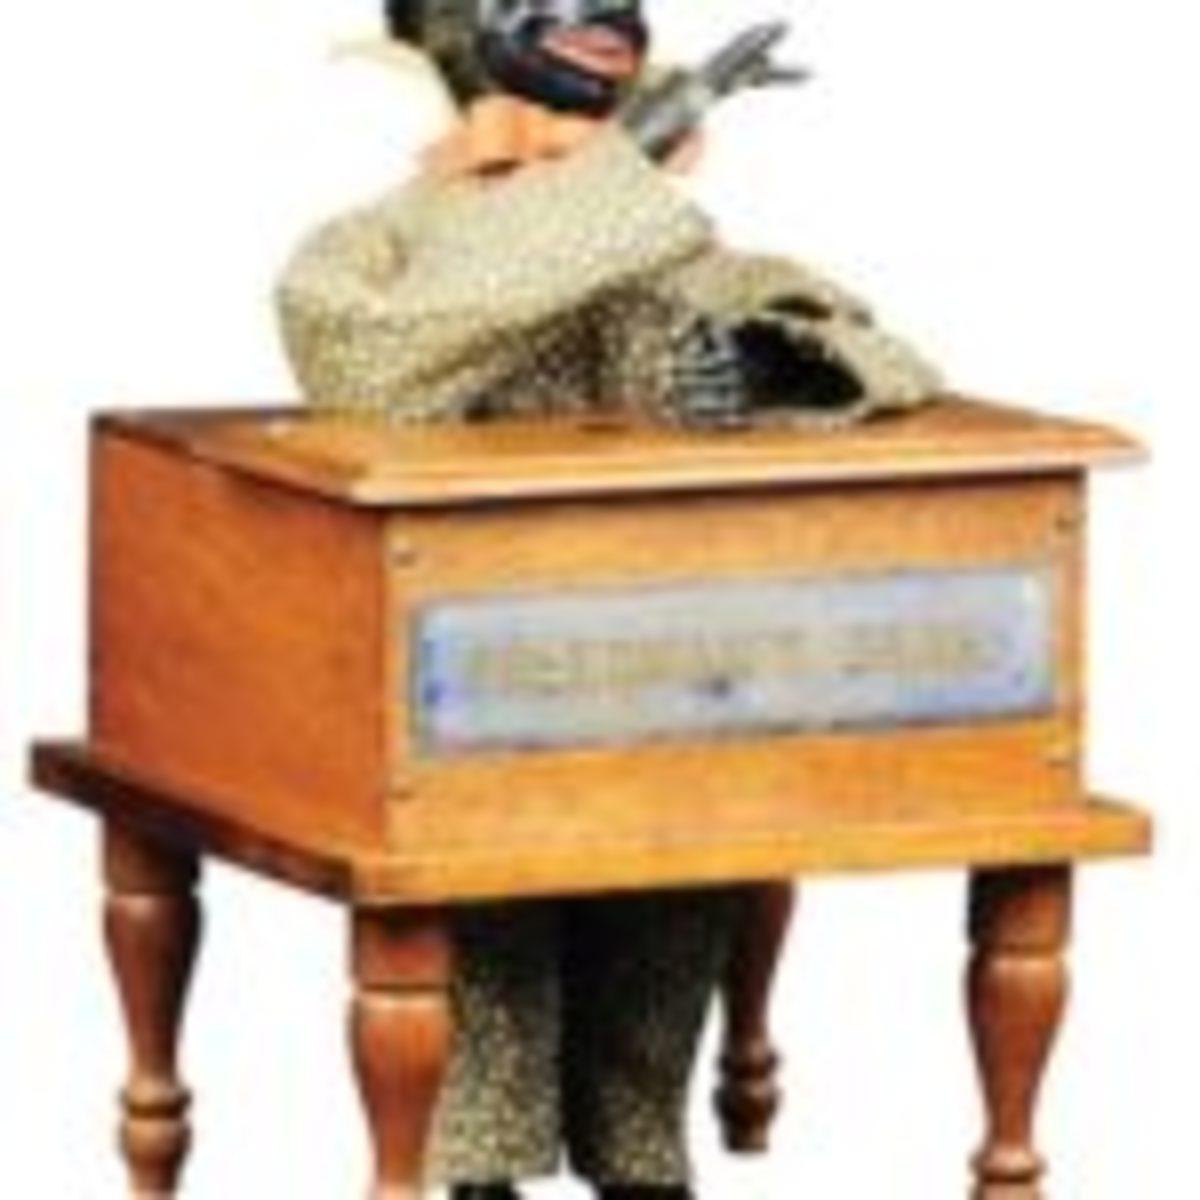 Jerome B. Secor 'Freedman's' mechanical bank